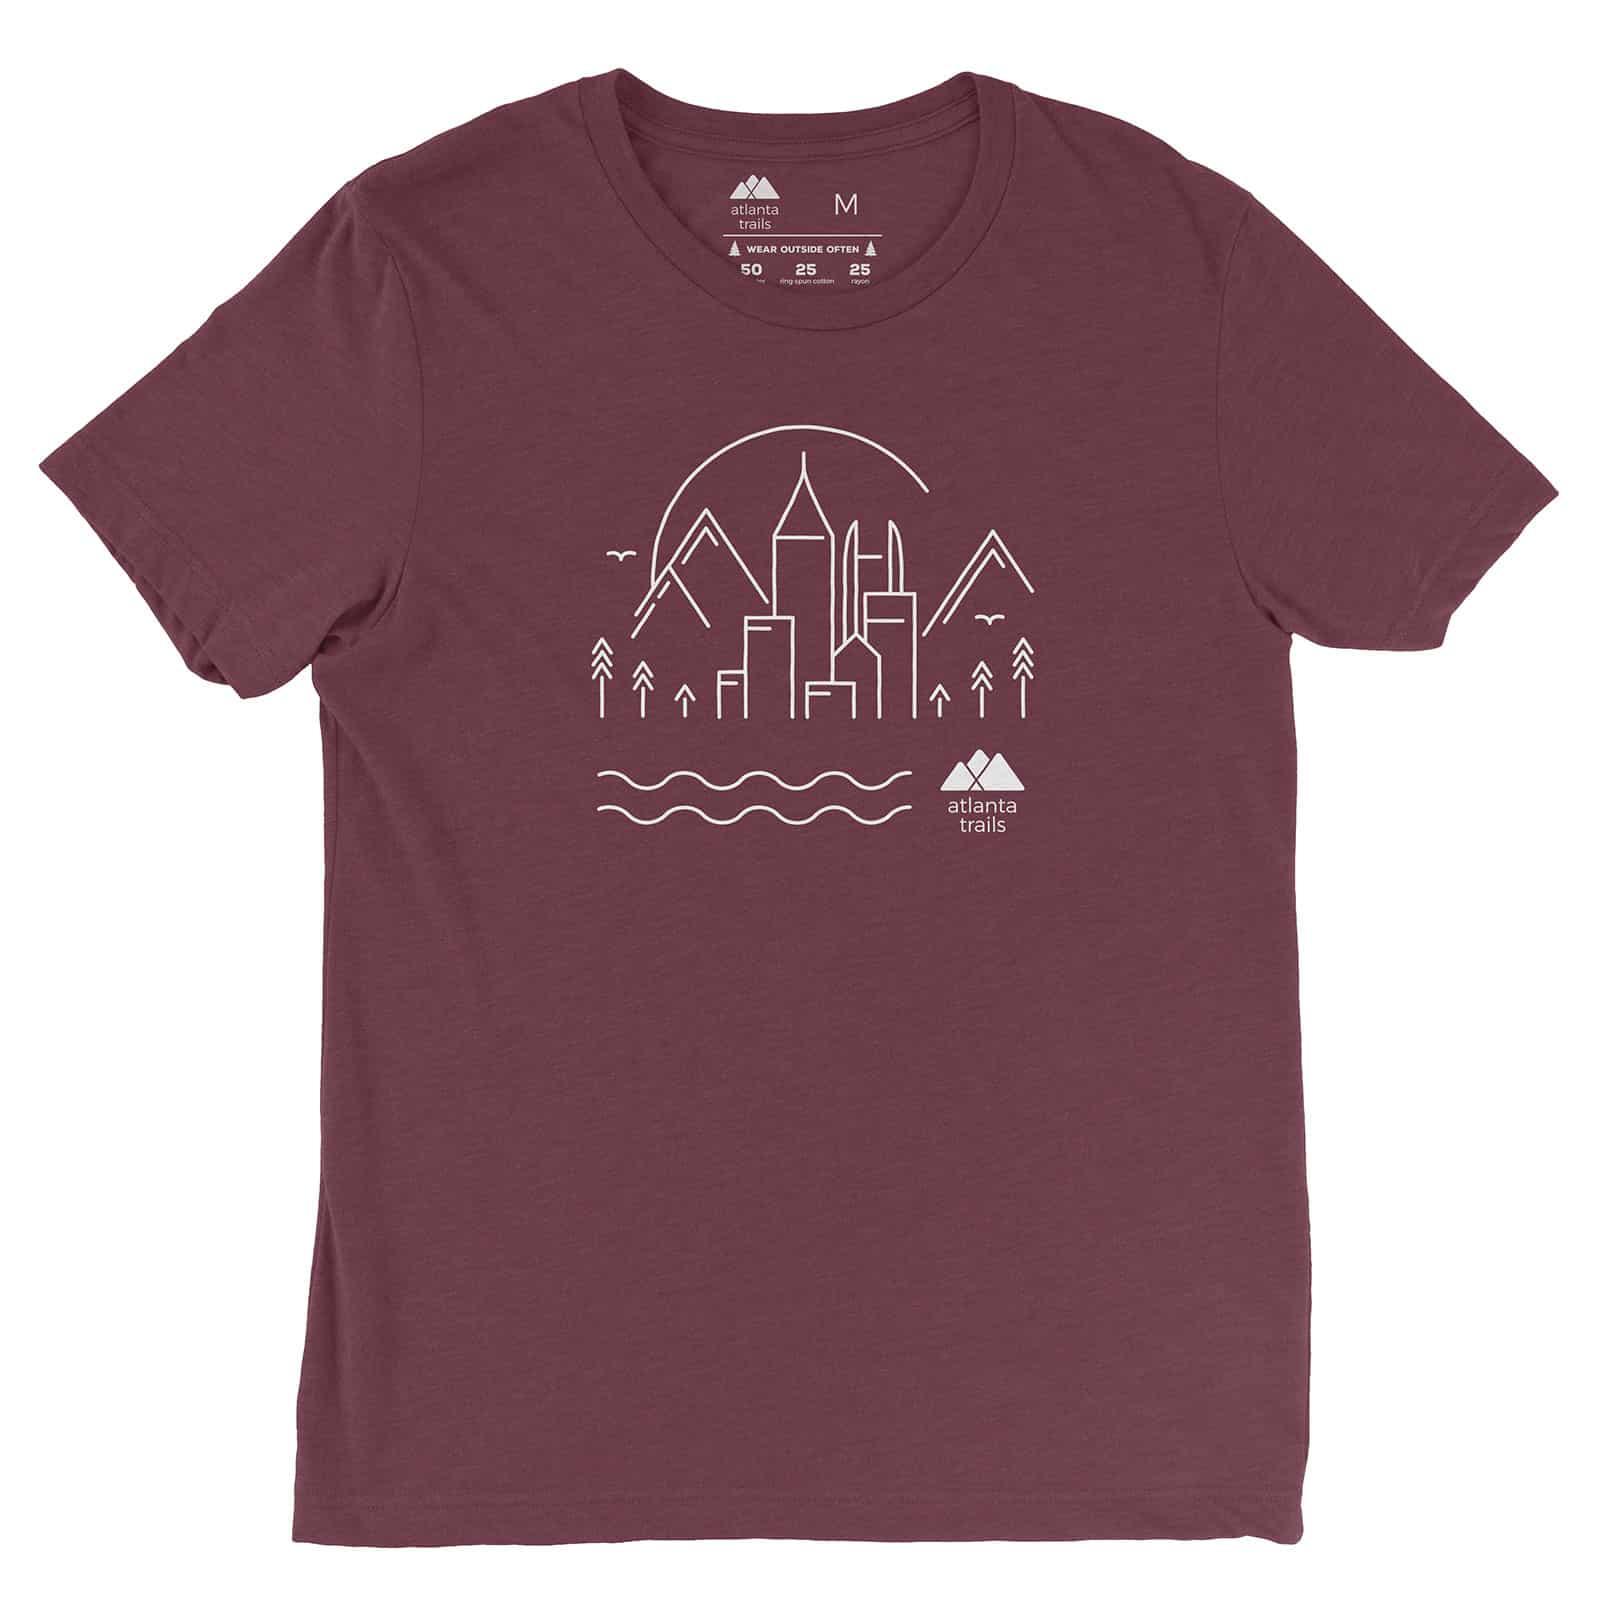 Atlanta trails skyline t shirt maroon for T shirt printing cartersville ga